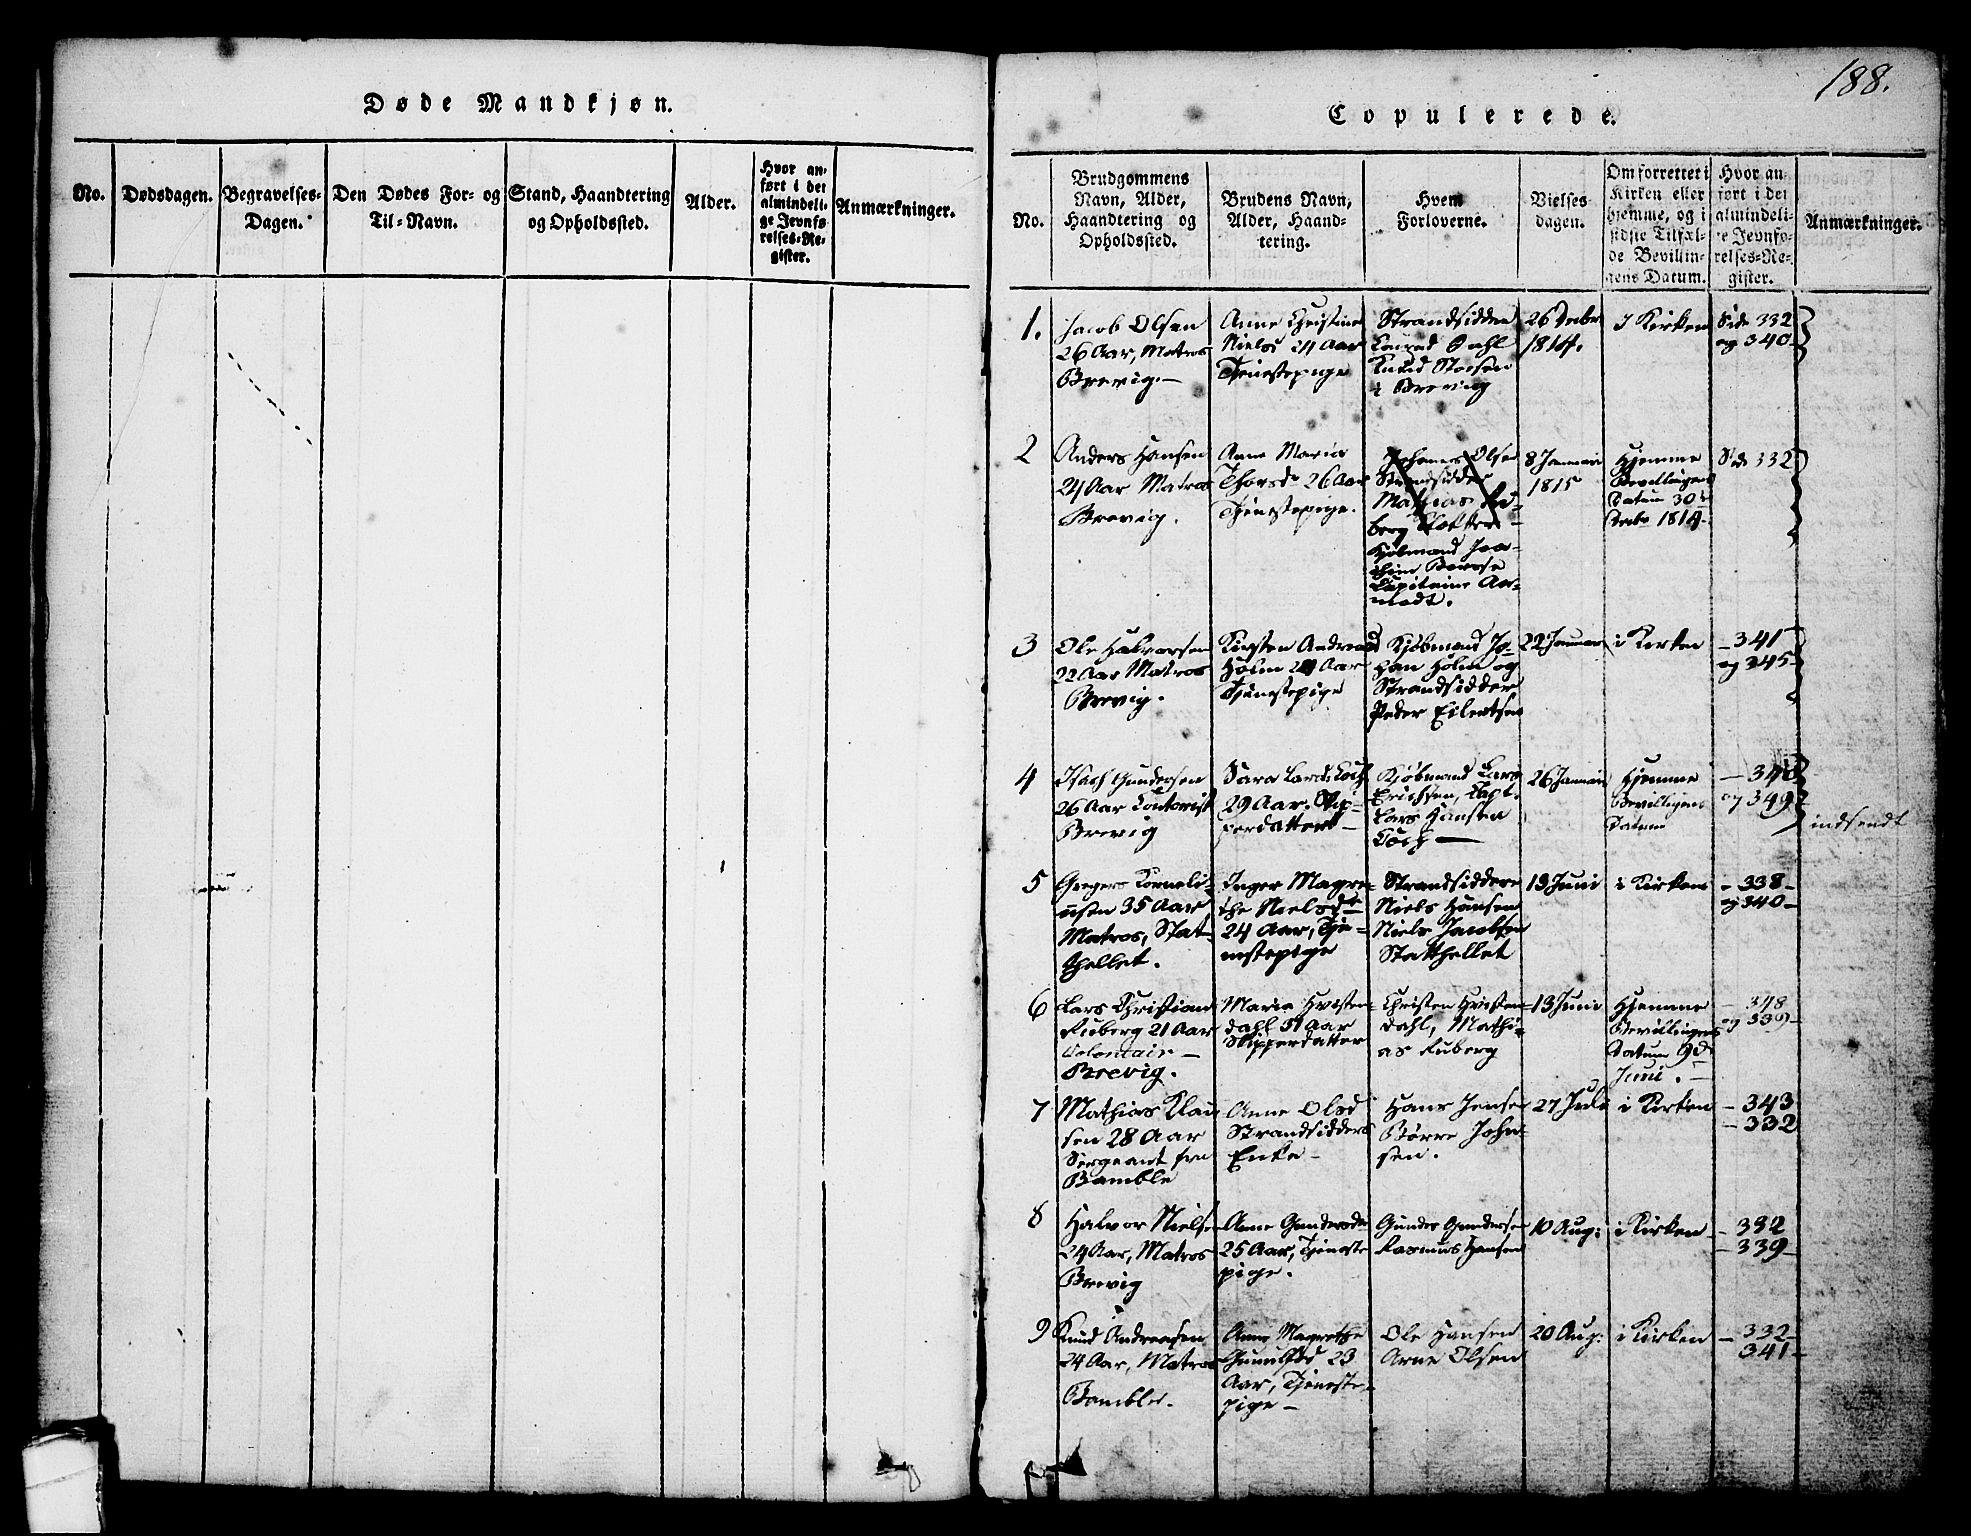 SAKO, Brevik kirkebøker, G/Ga/L0001: Klokkerbok nr. 1, 1814-1845, s. 188